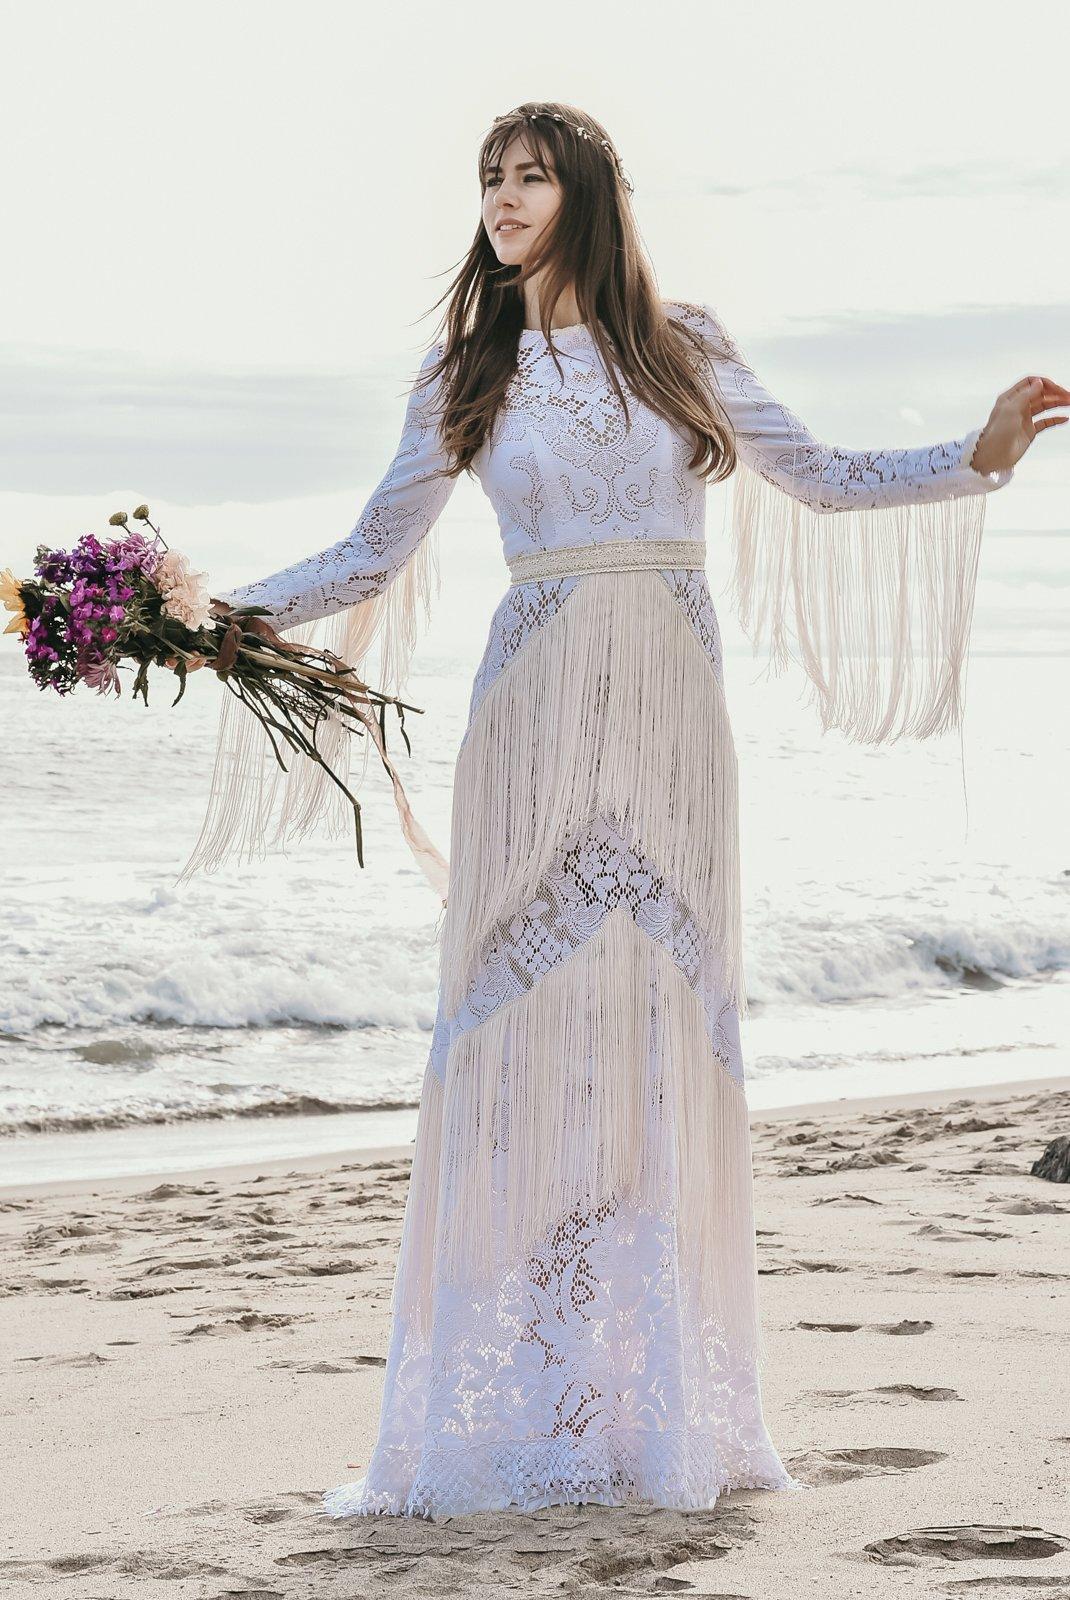 8 Zero waste, eco friendly, ethical wedding dresses from www.goingzerowaste.com #ethical #ecofriendly #zerowaste #weddingdresses #zerowastewedding #ecofriendlywedding #sustainableweddings